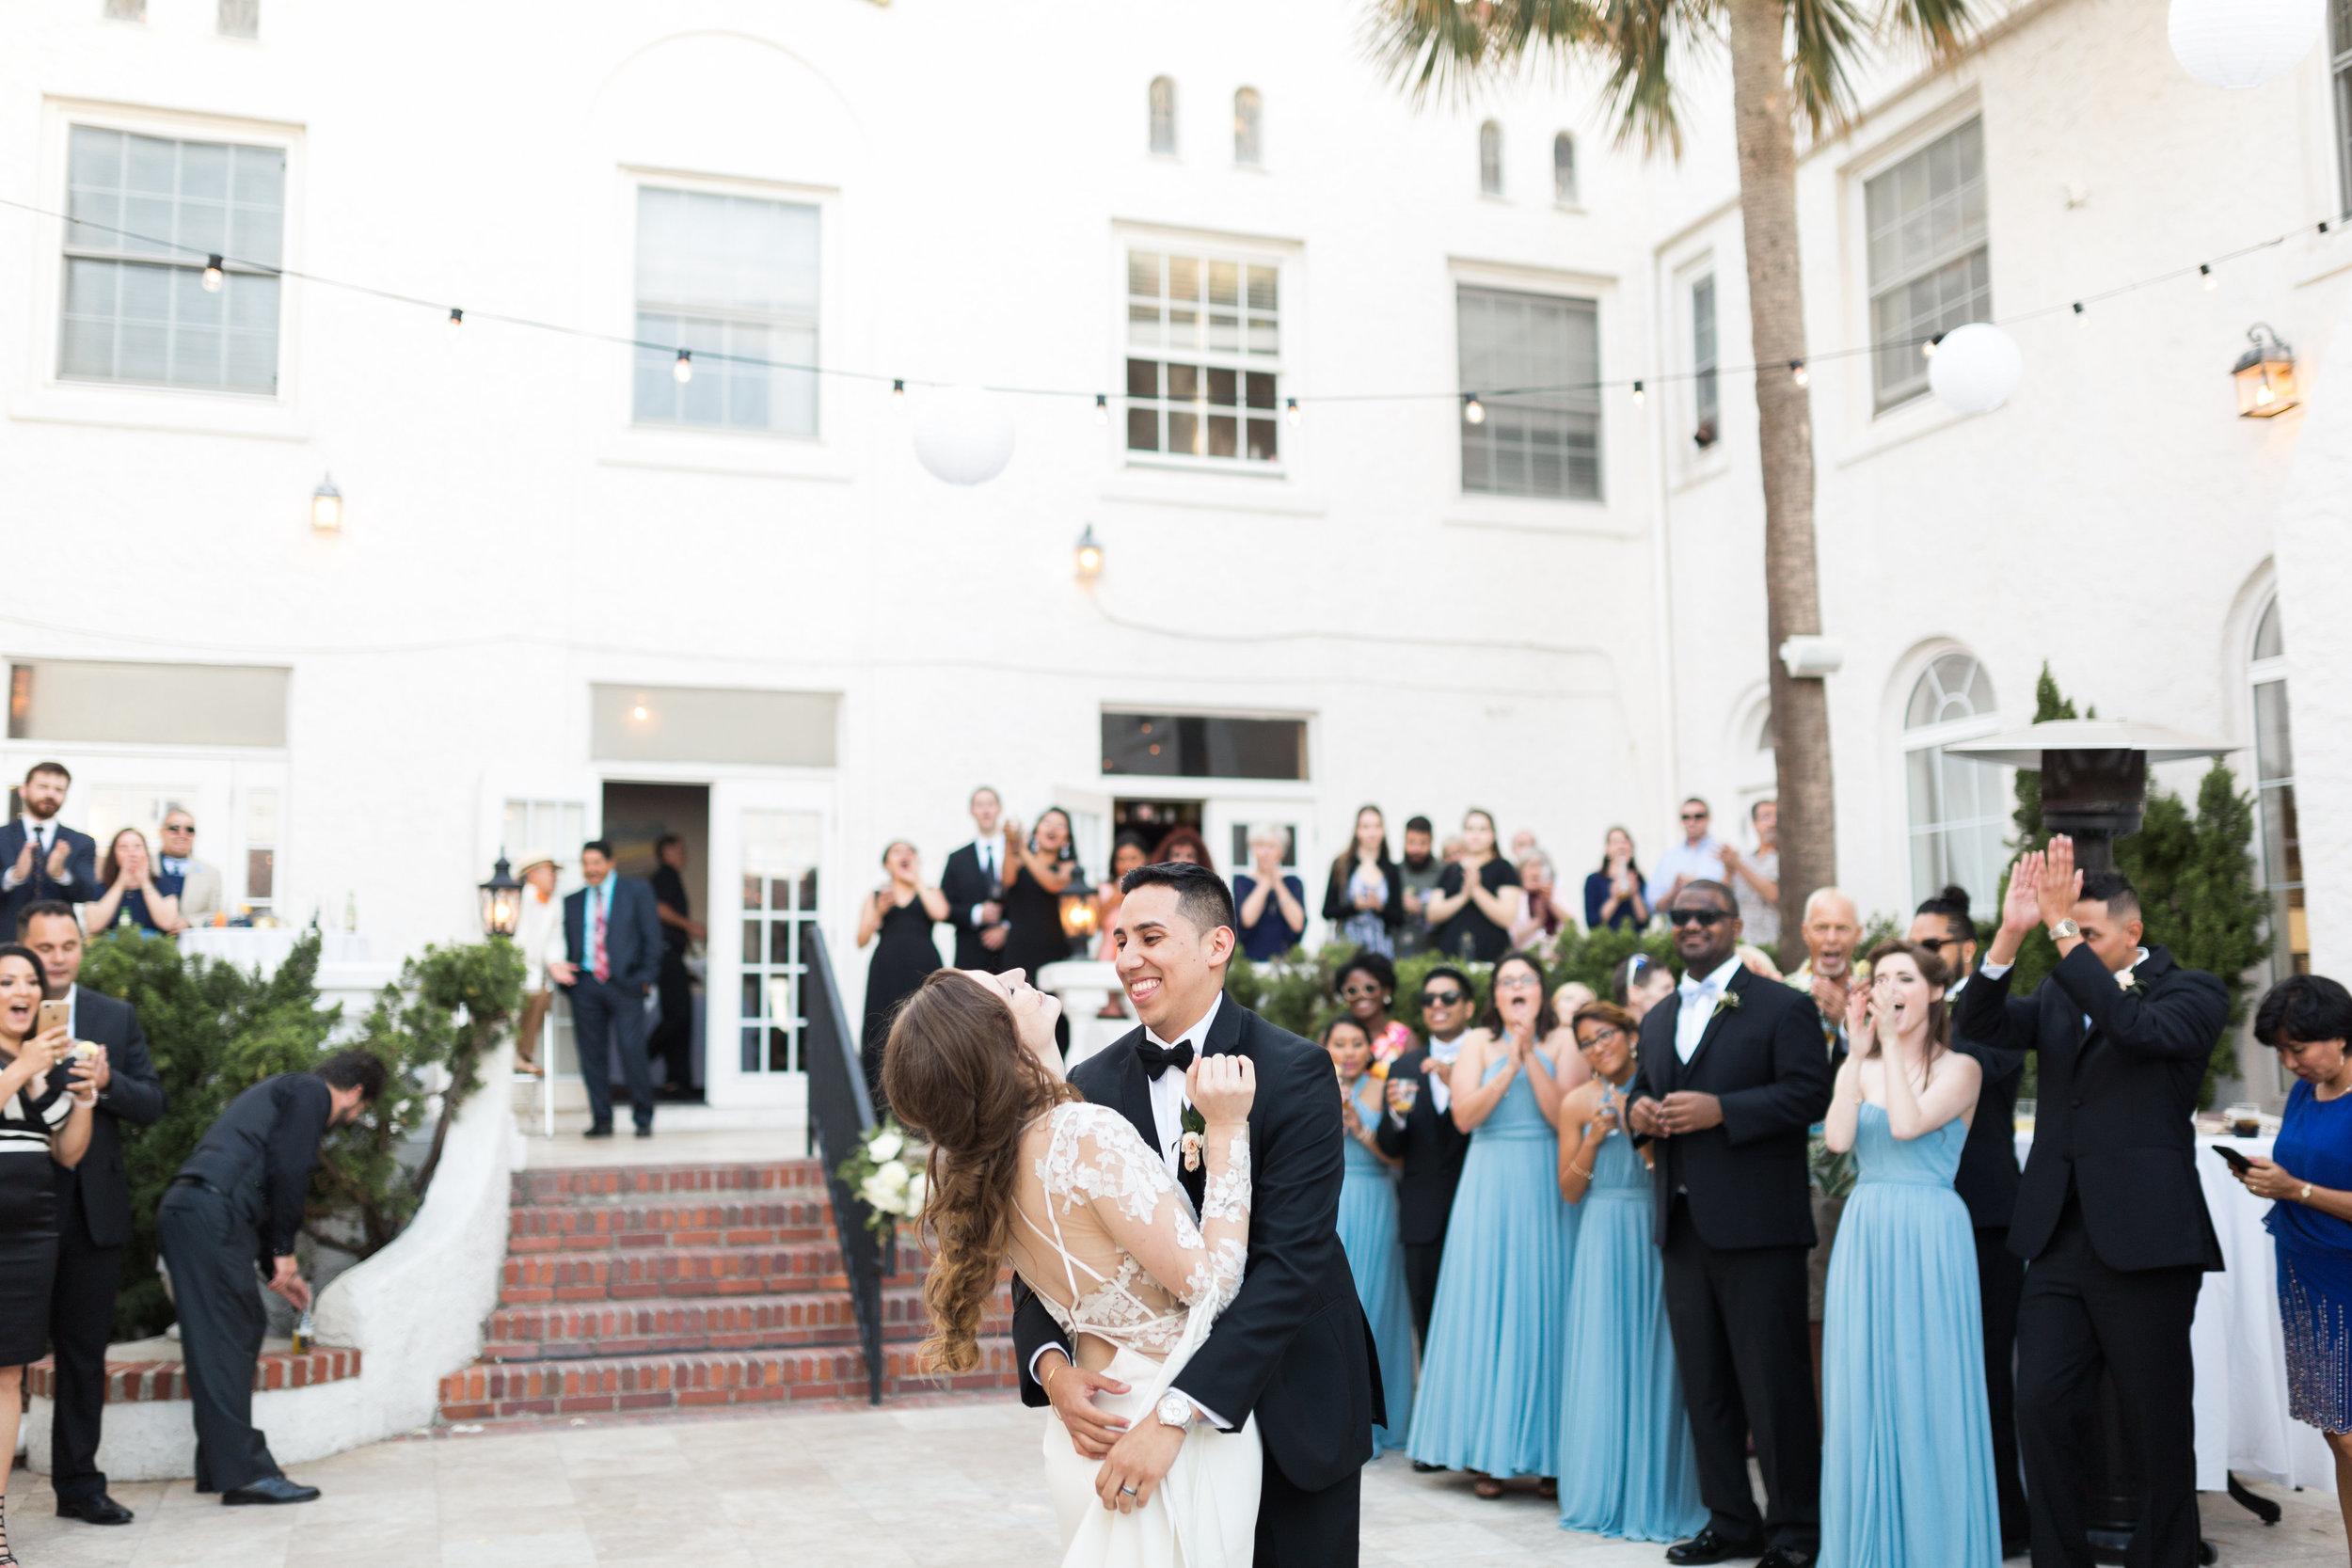 loba design co. - WEDDING PLANNINGBOUTIQUE STYLE EVENT DESIGN & PRODUCTION